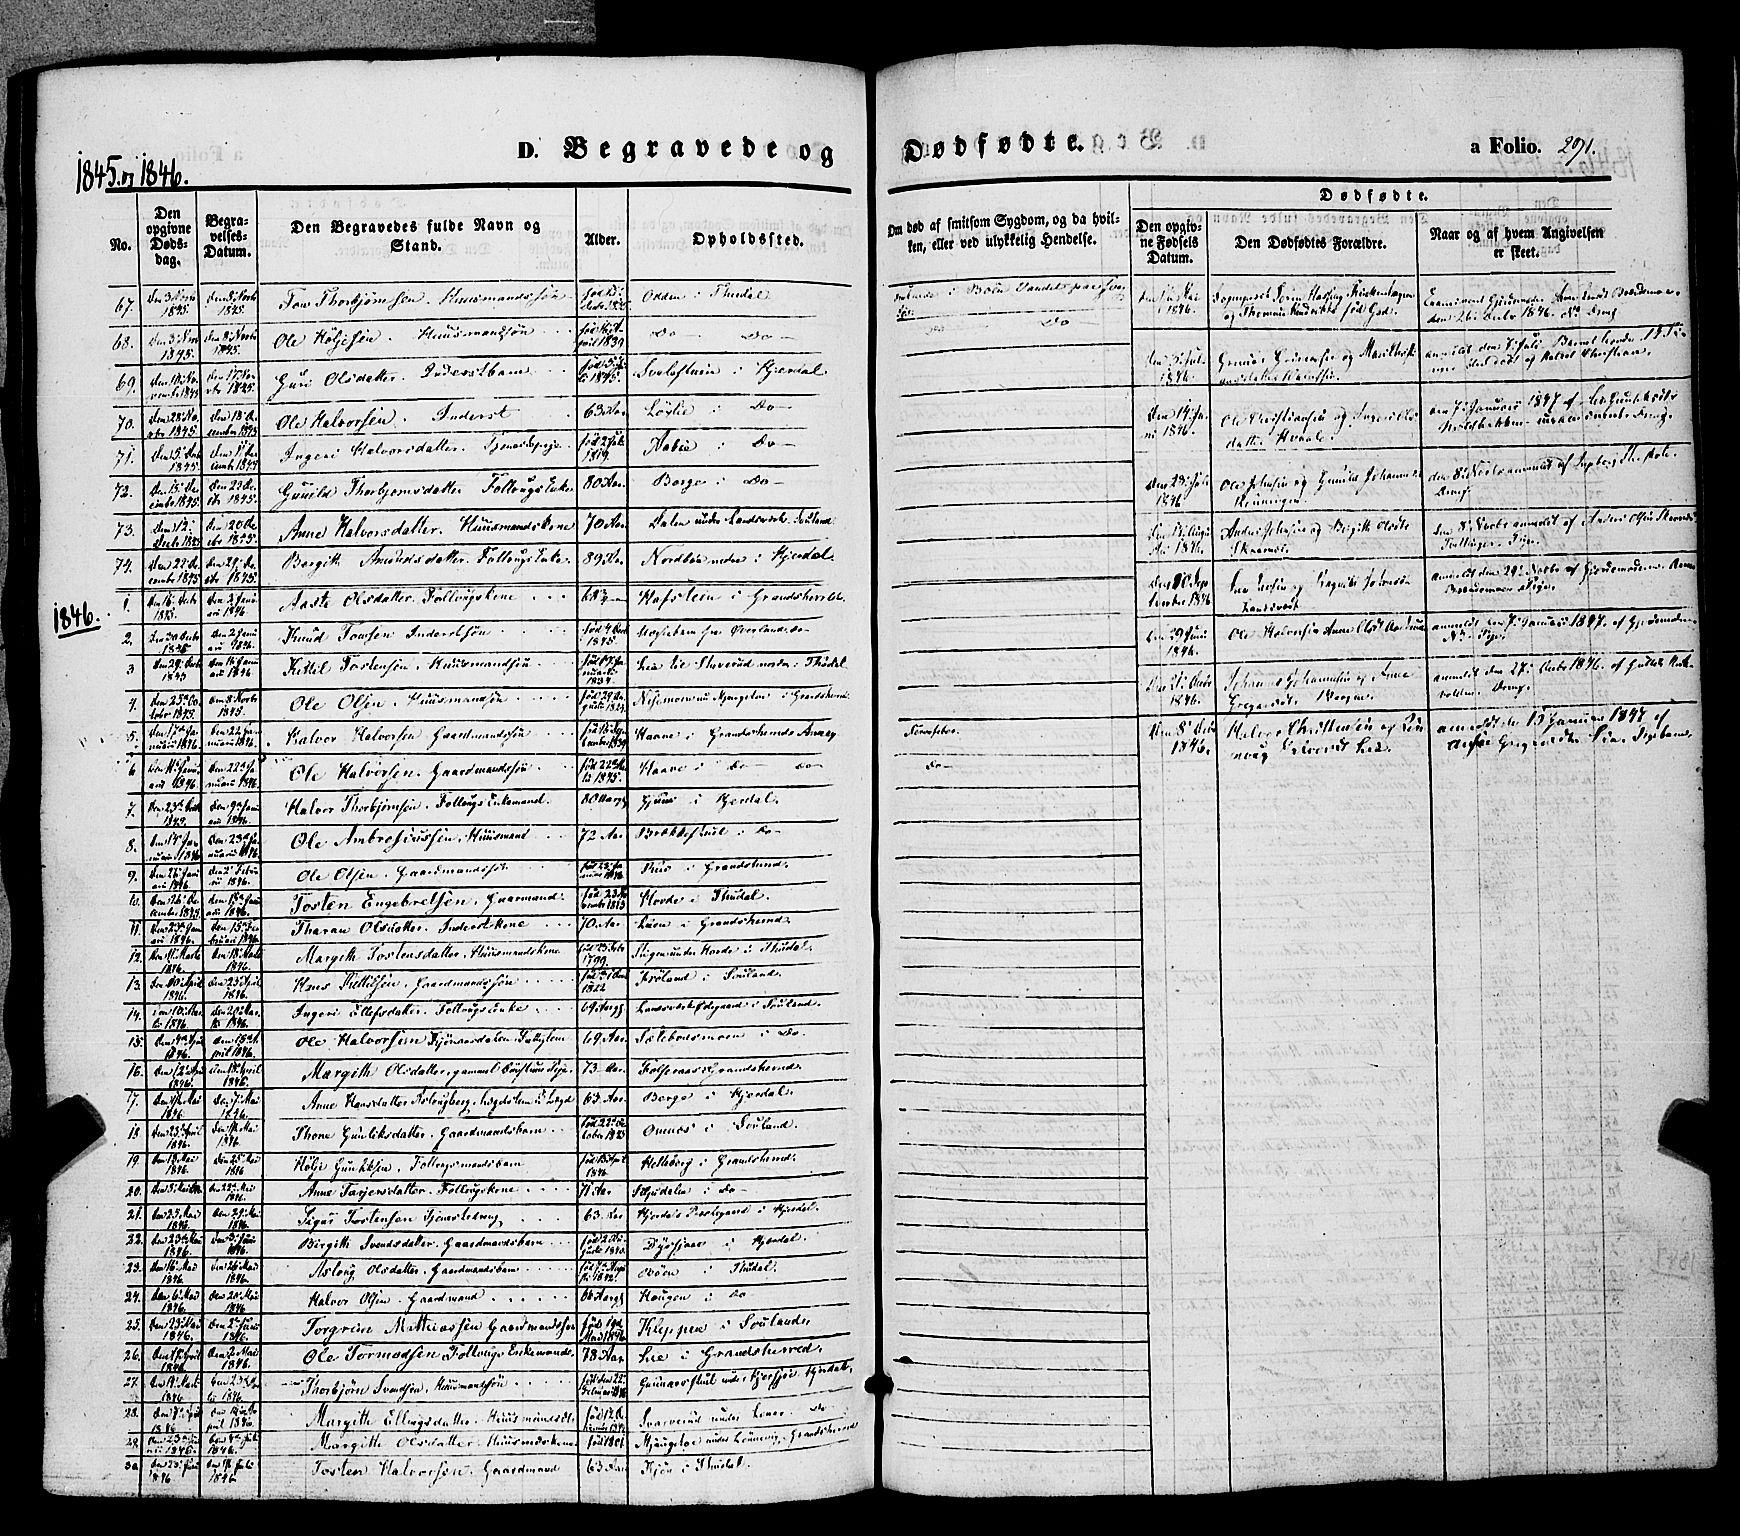 SAKO, Hjartdal kirkebøker, F/Fa/L0008: Ministerialbok nr. I 8, 1844-1859, s. 291